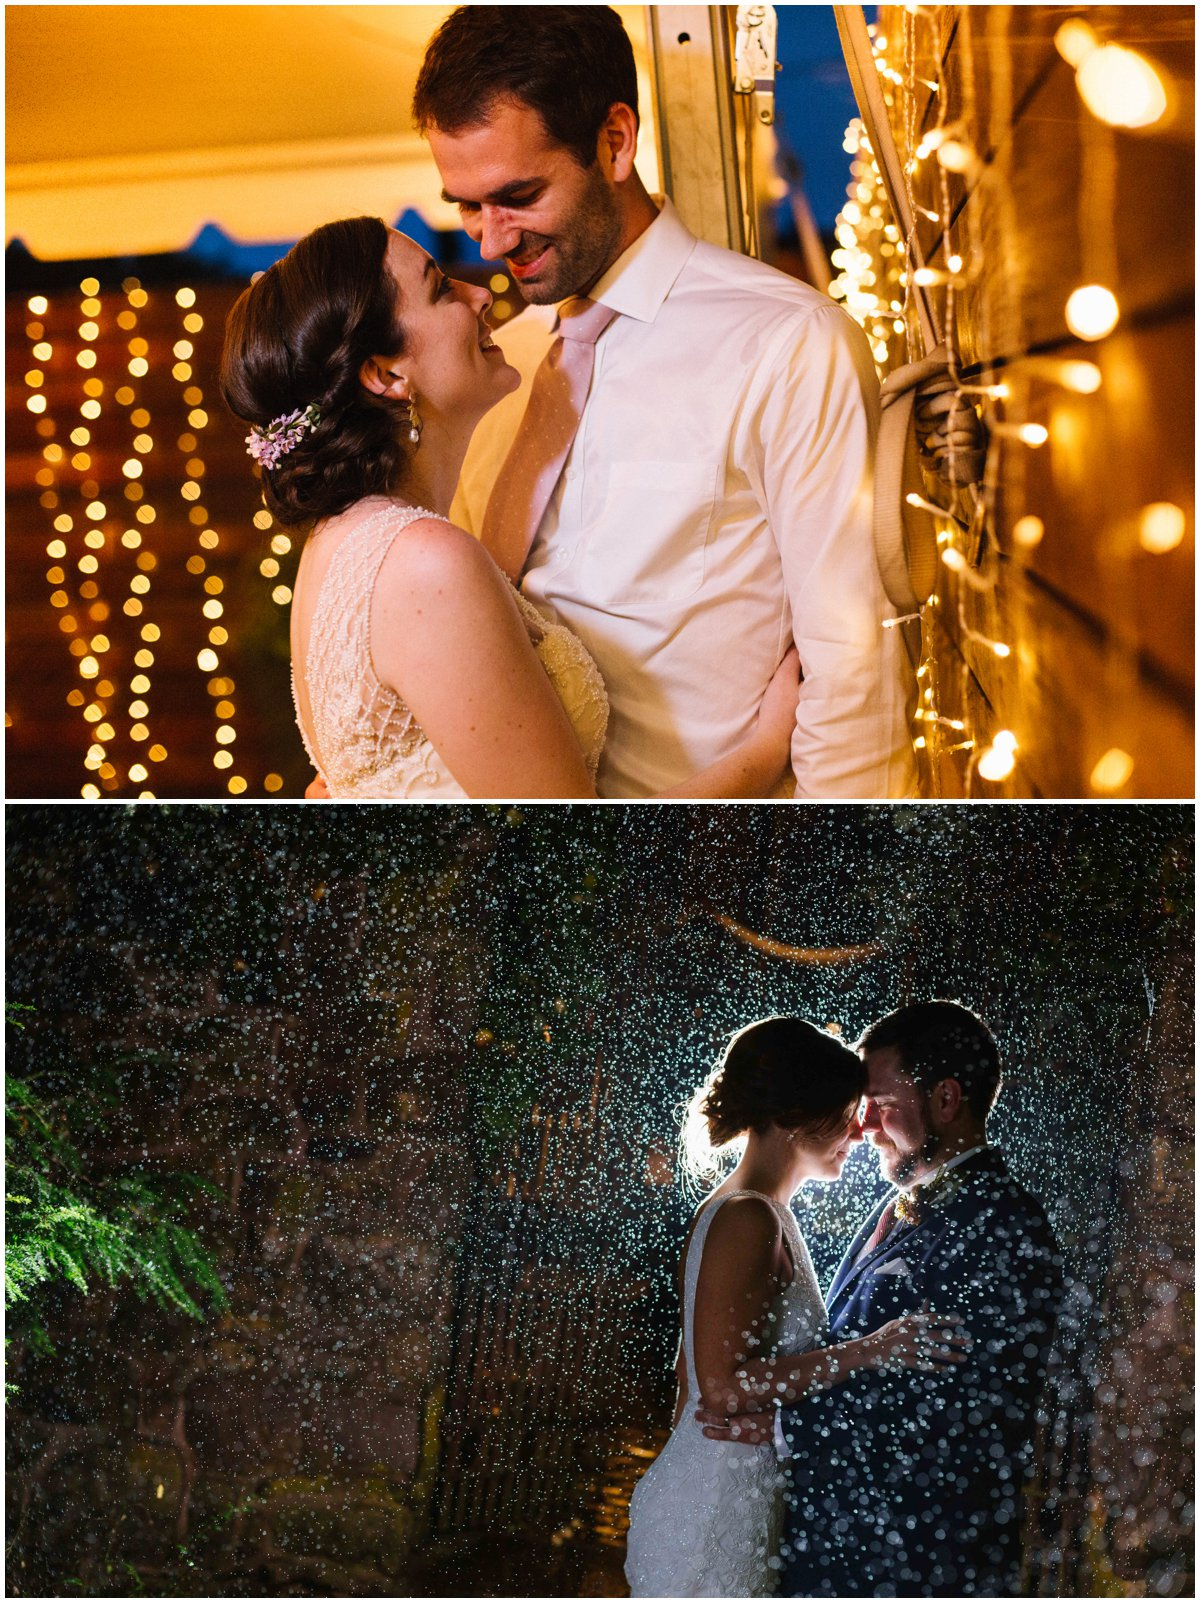 urban-row-photography-rosewood-farms-rainy-wedding-night-shot_0014.jpg